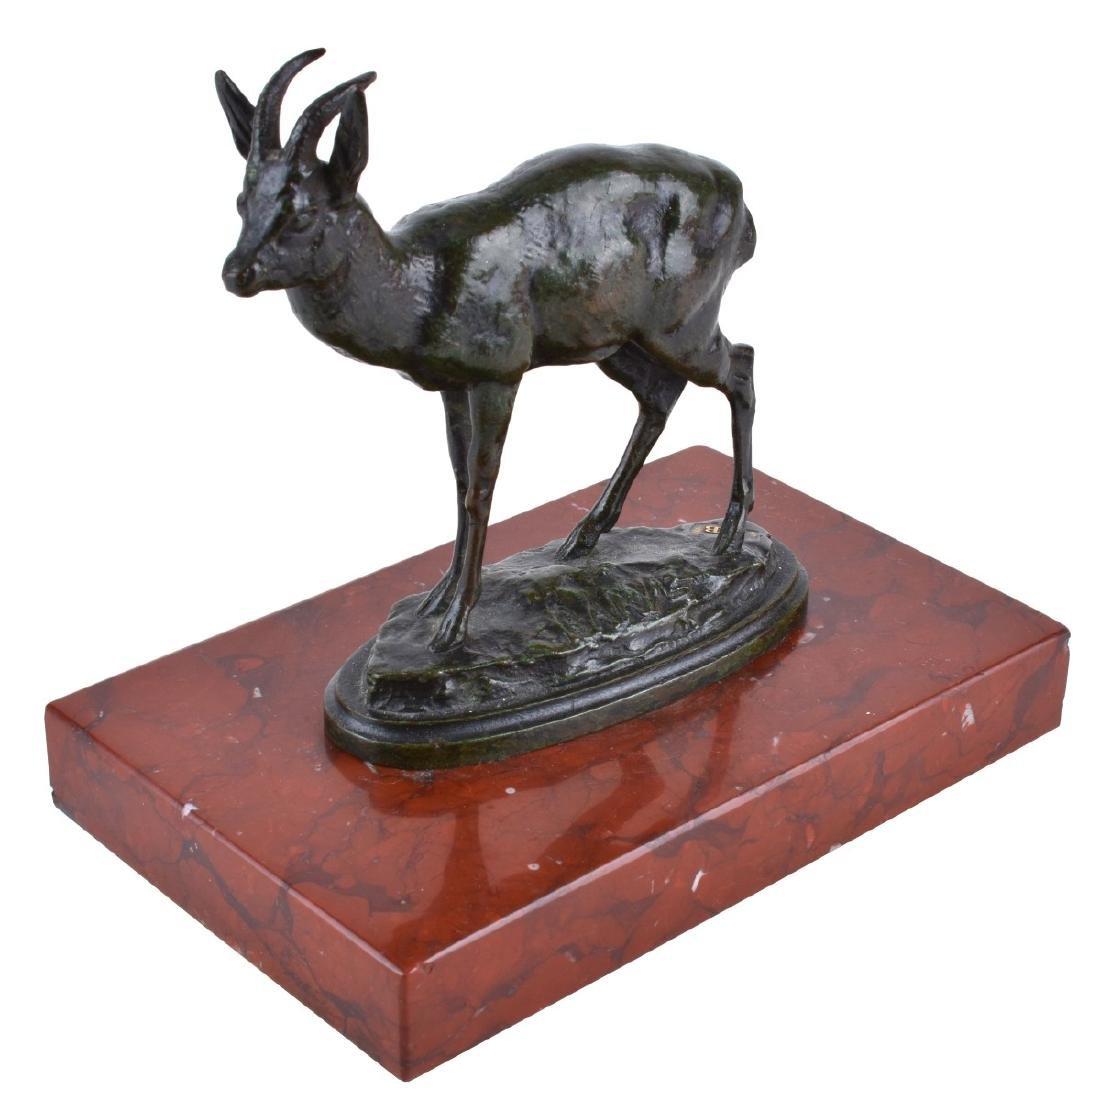 Antoine-Louis Barye, French (1795 - 1875) Bronze